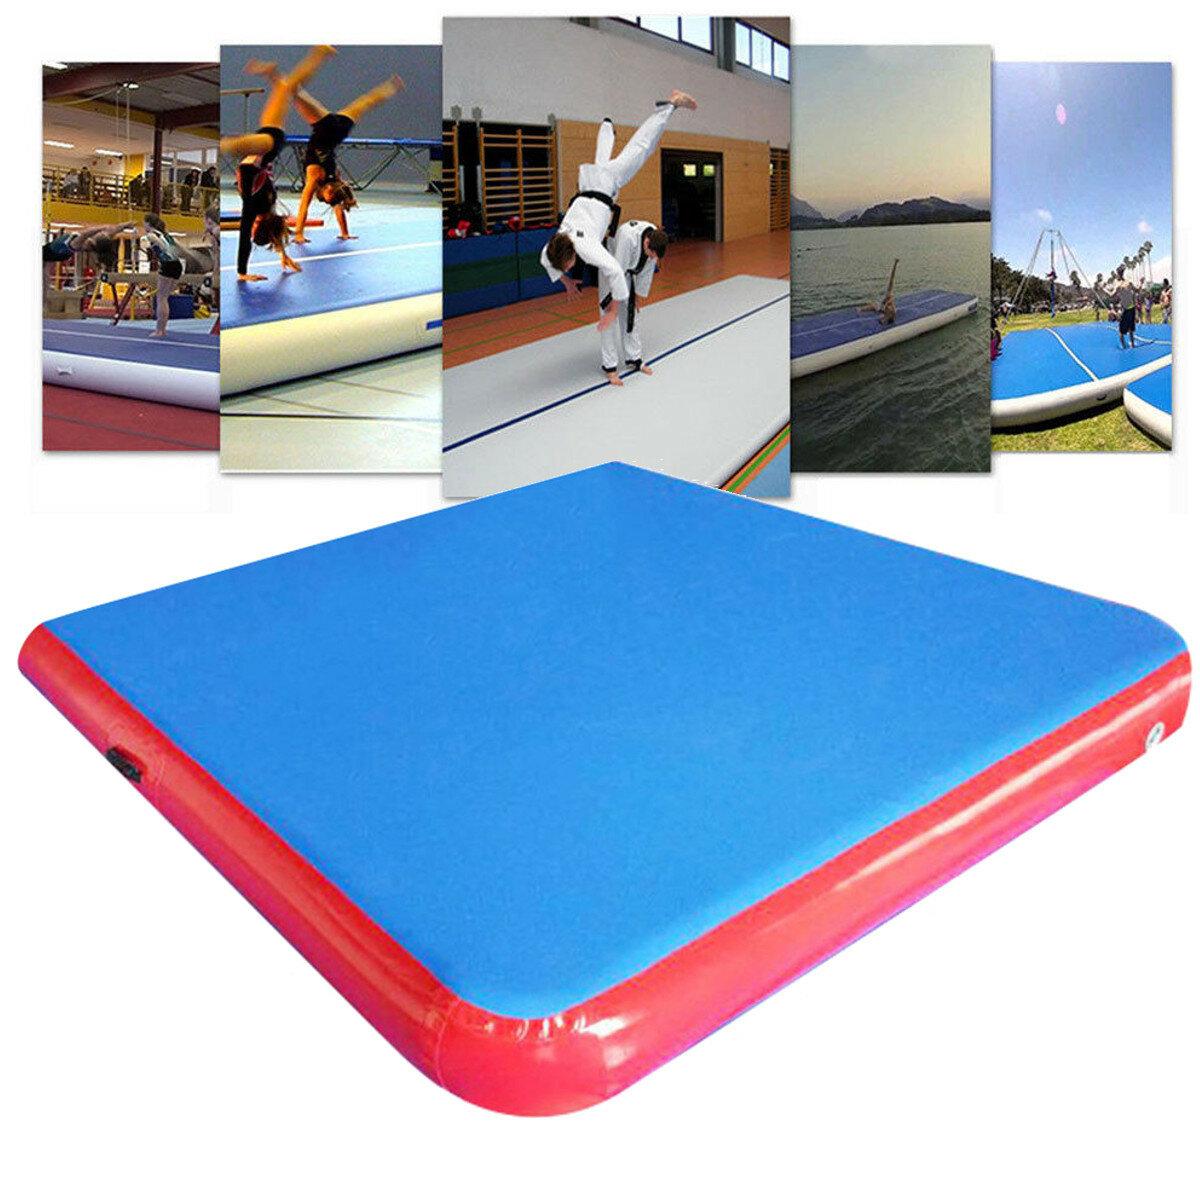 79×79×4inch Inflatable GYM Air Track Mat Airtrack Gymnastics Mat Tumbling Climbing Pilates Pad